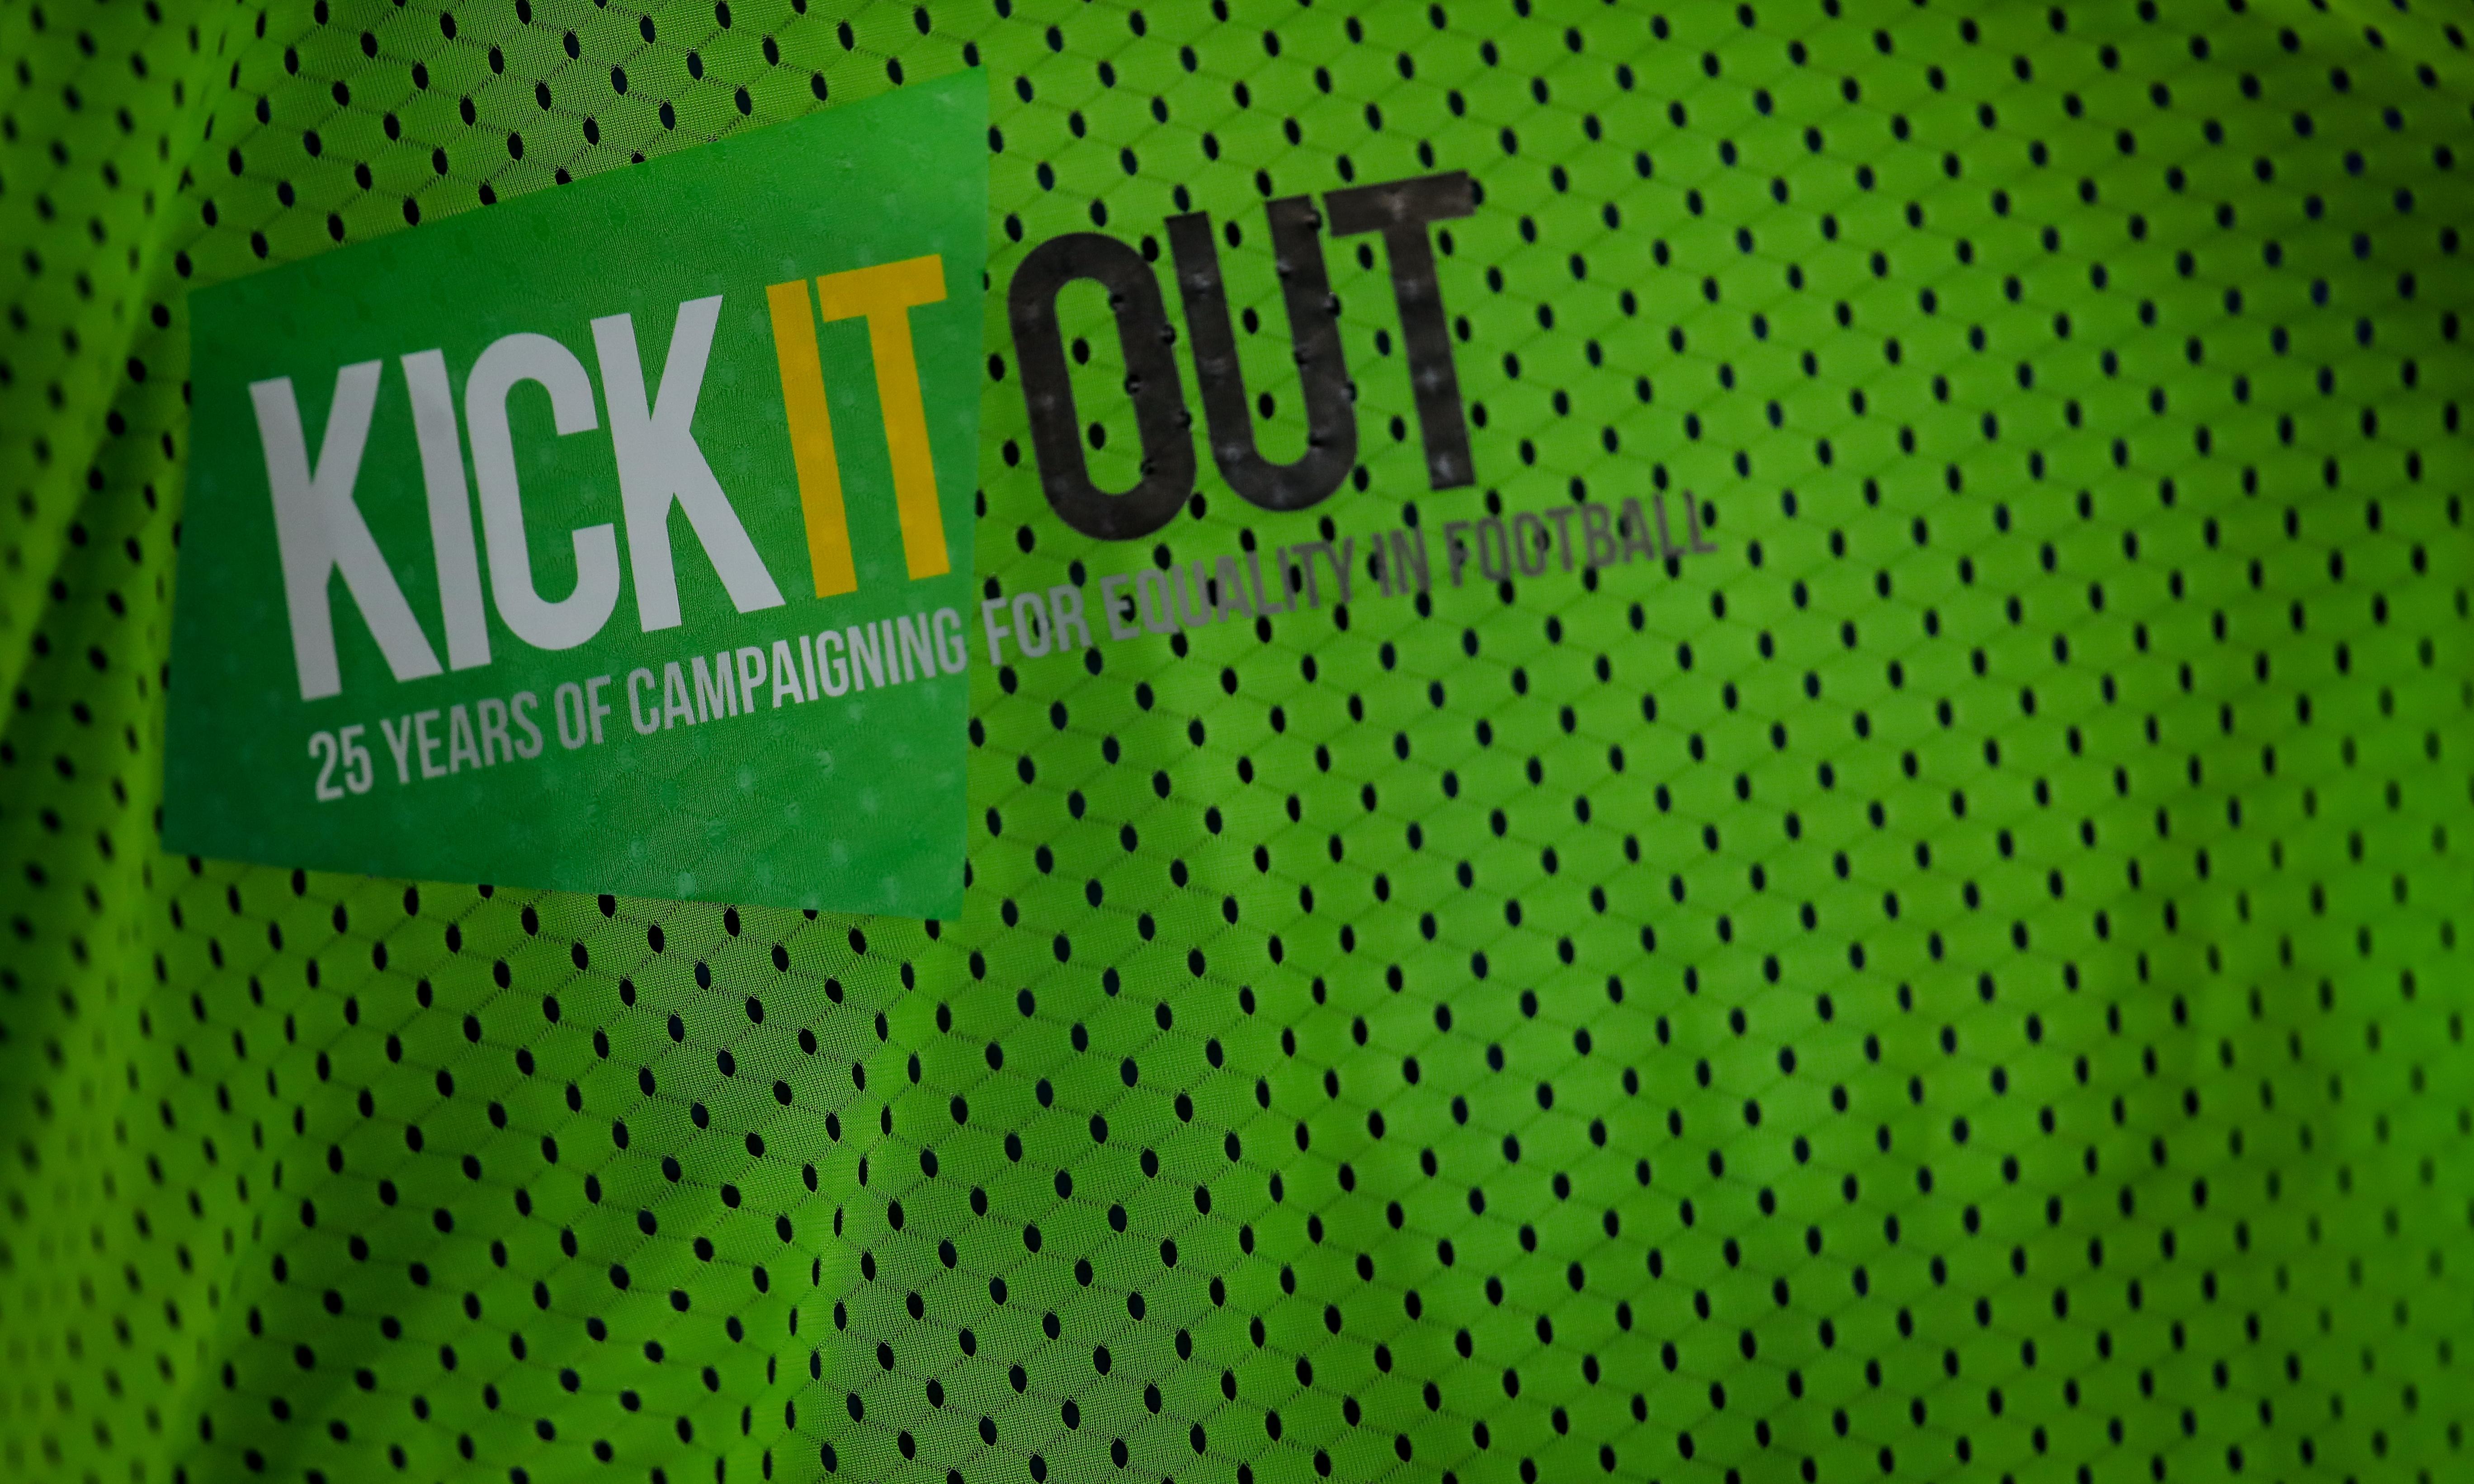 Premier League risks Kick It Out confusion with 'No Room for Racism' campaign